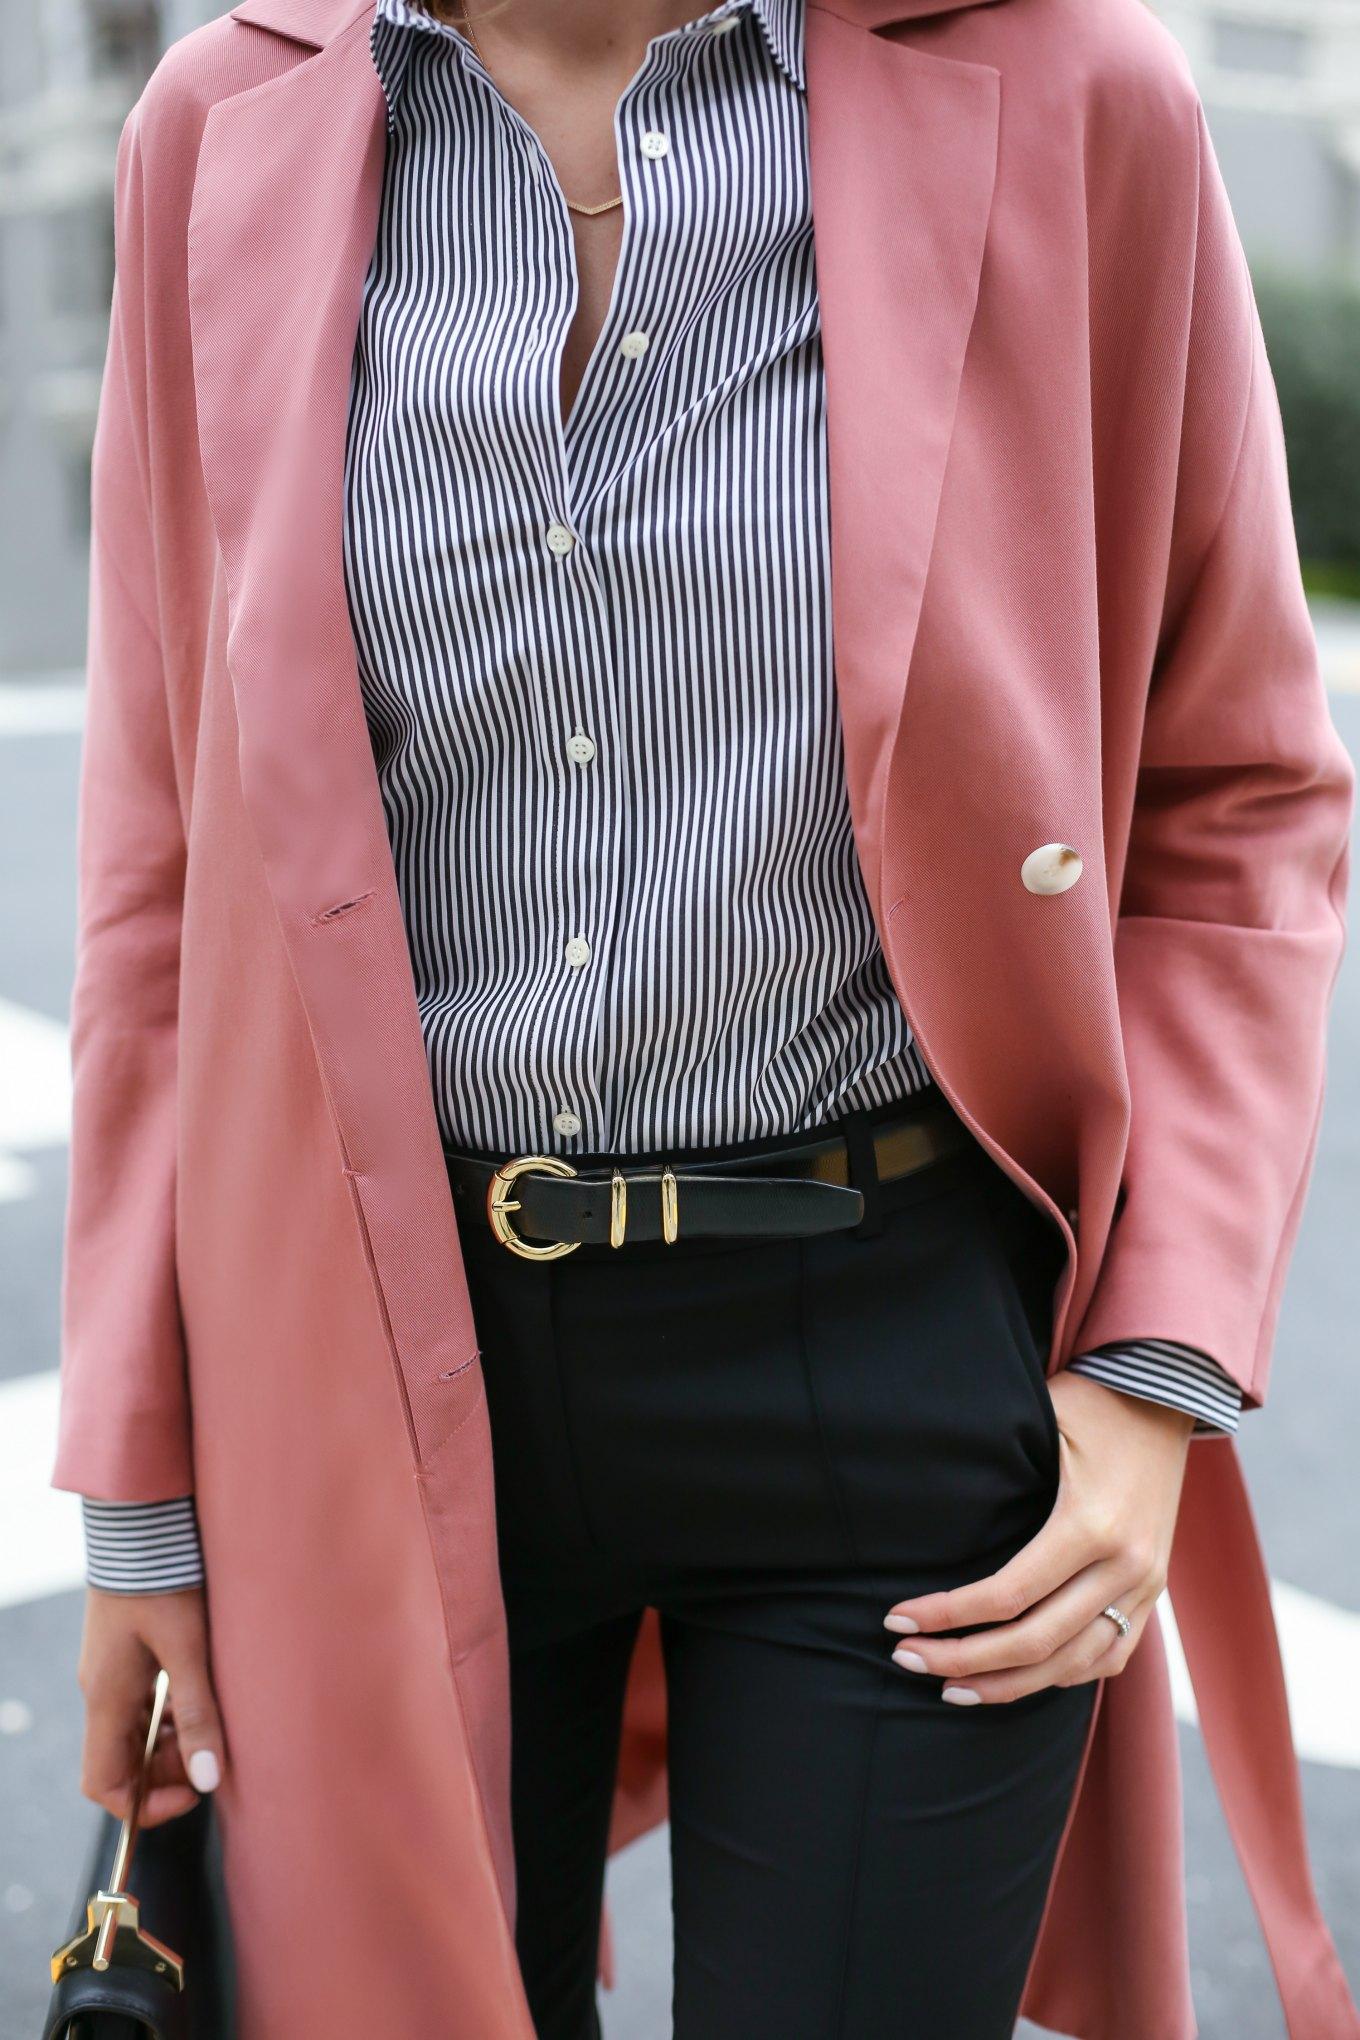 everlane-goweave-crop-trouse-sjp-collection-fawn-pumps-reiss-trench-jcrew-striped-perfect-shirt-memorandum-work-office-wear-style-fashion-blog6